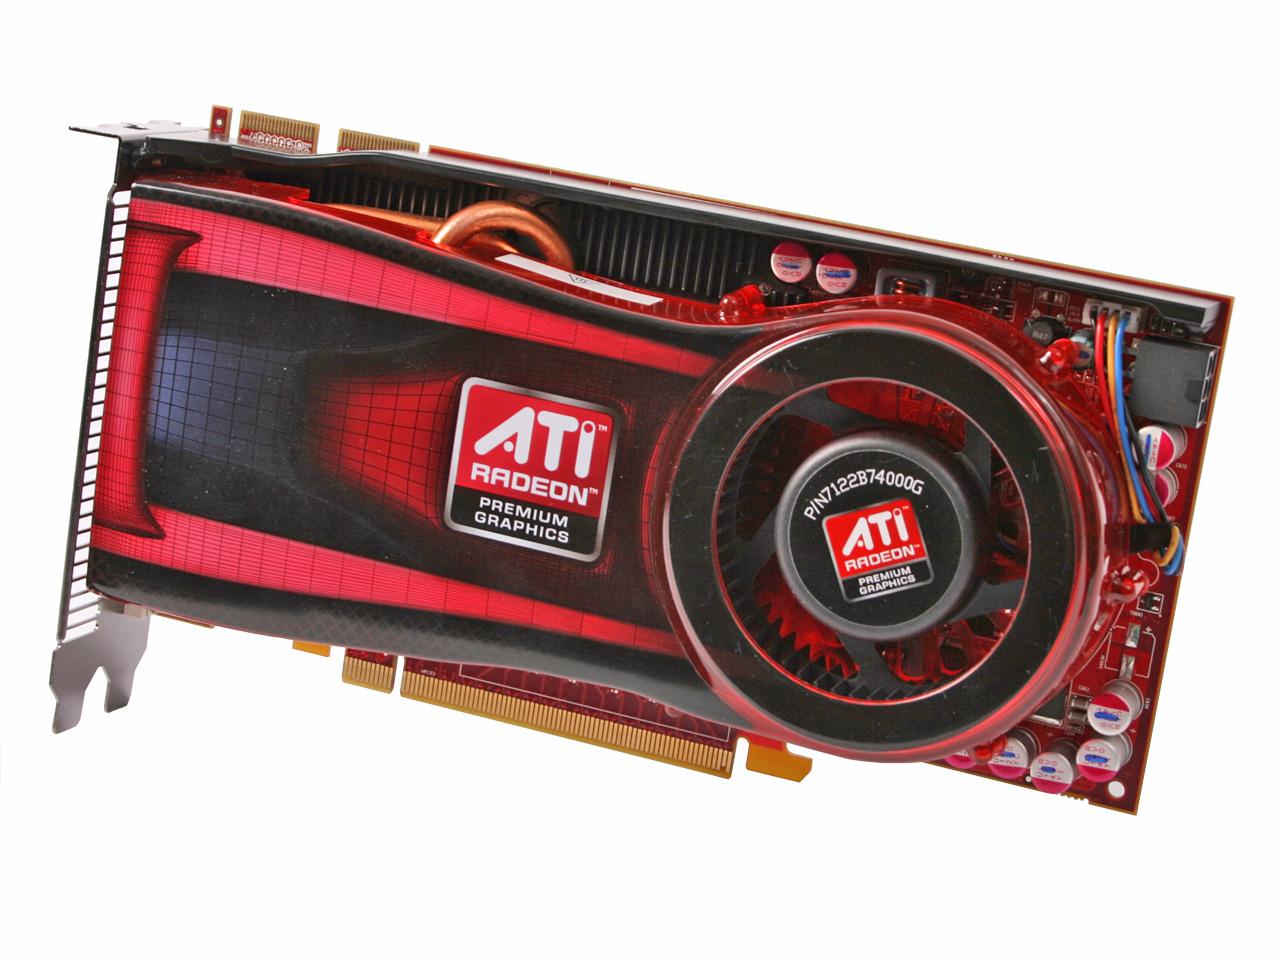 Amd Radeon Hd 4770 Driver Download